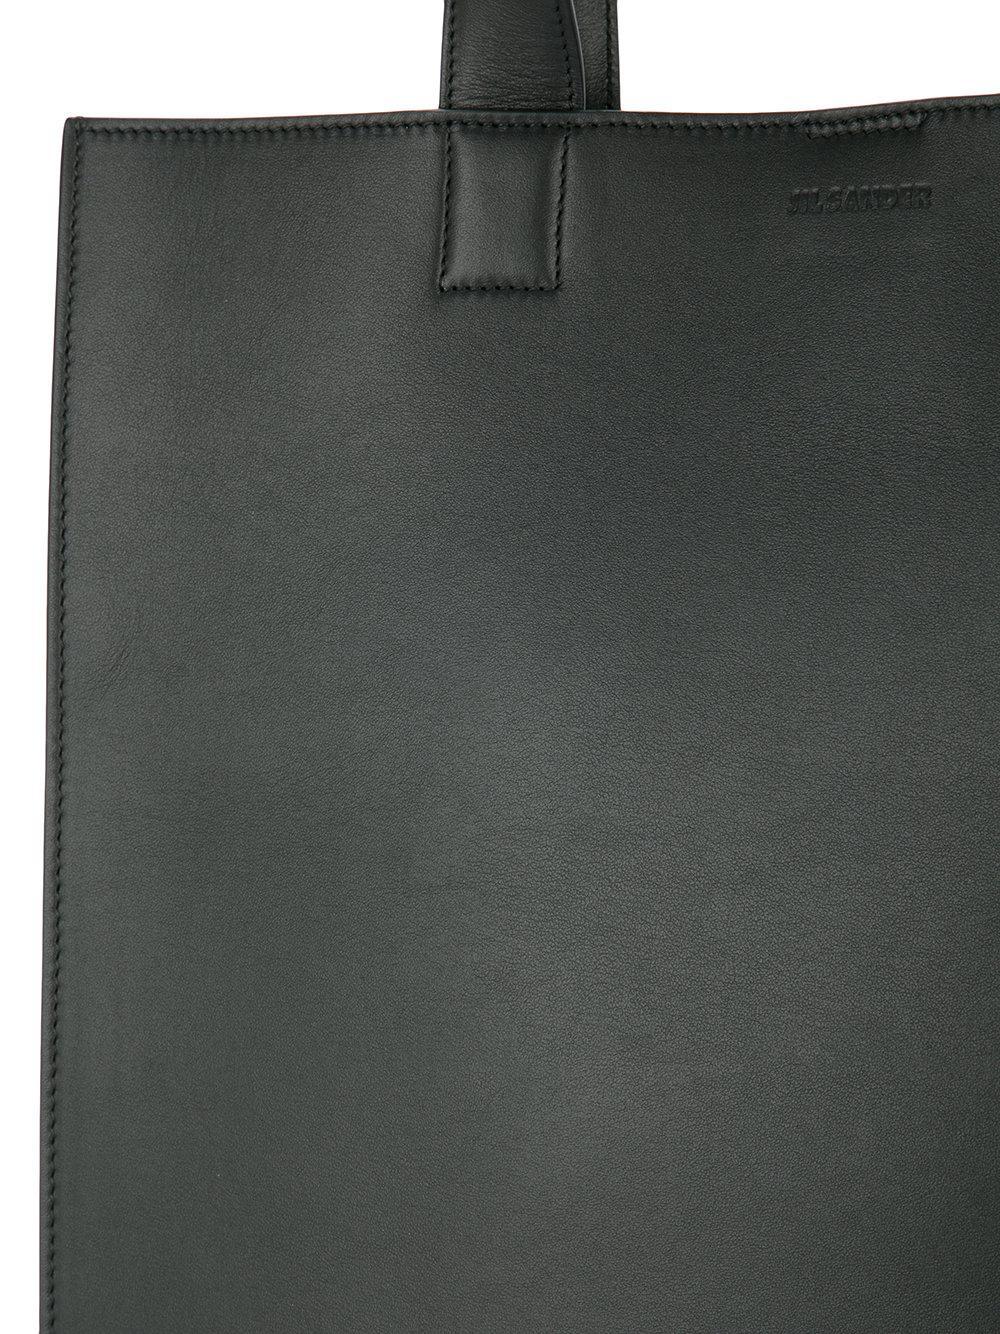 Jil Sander Leather Minimal Tote in Black